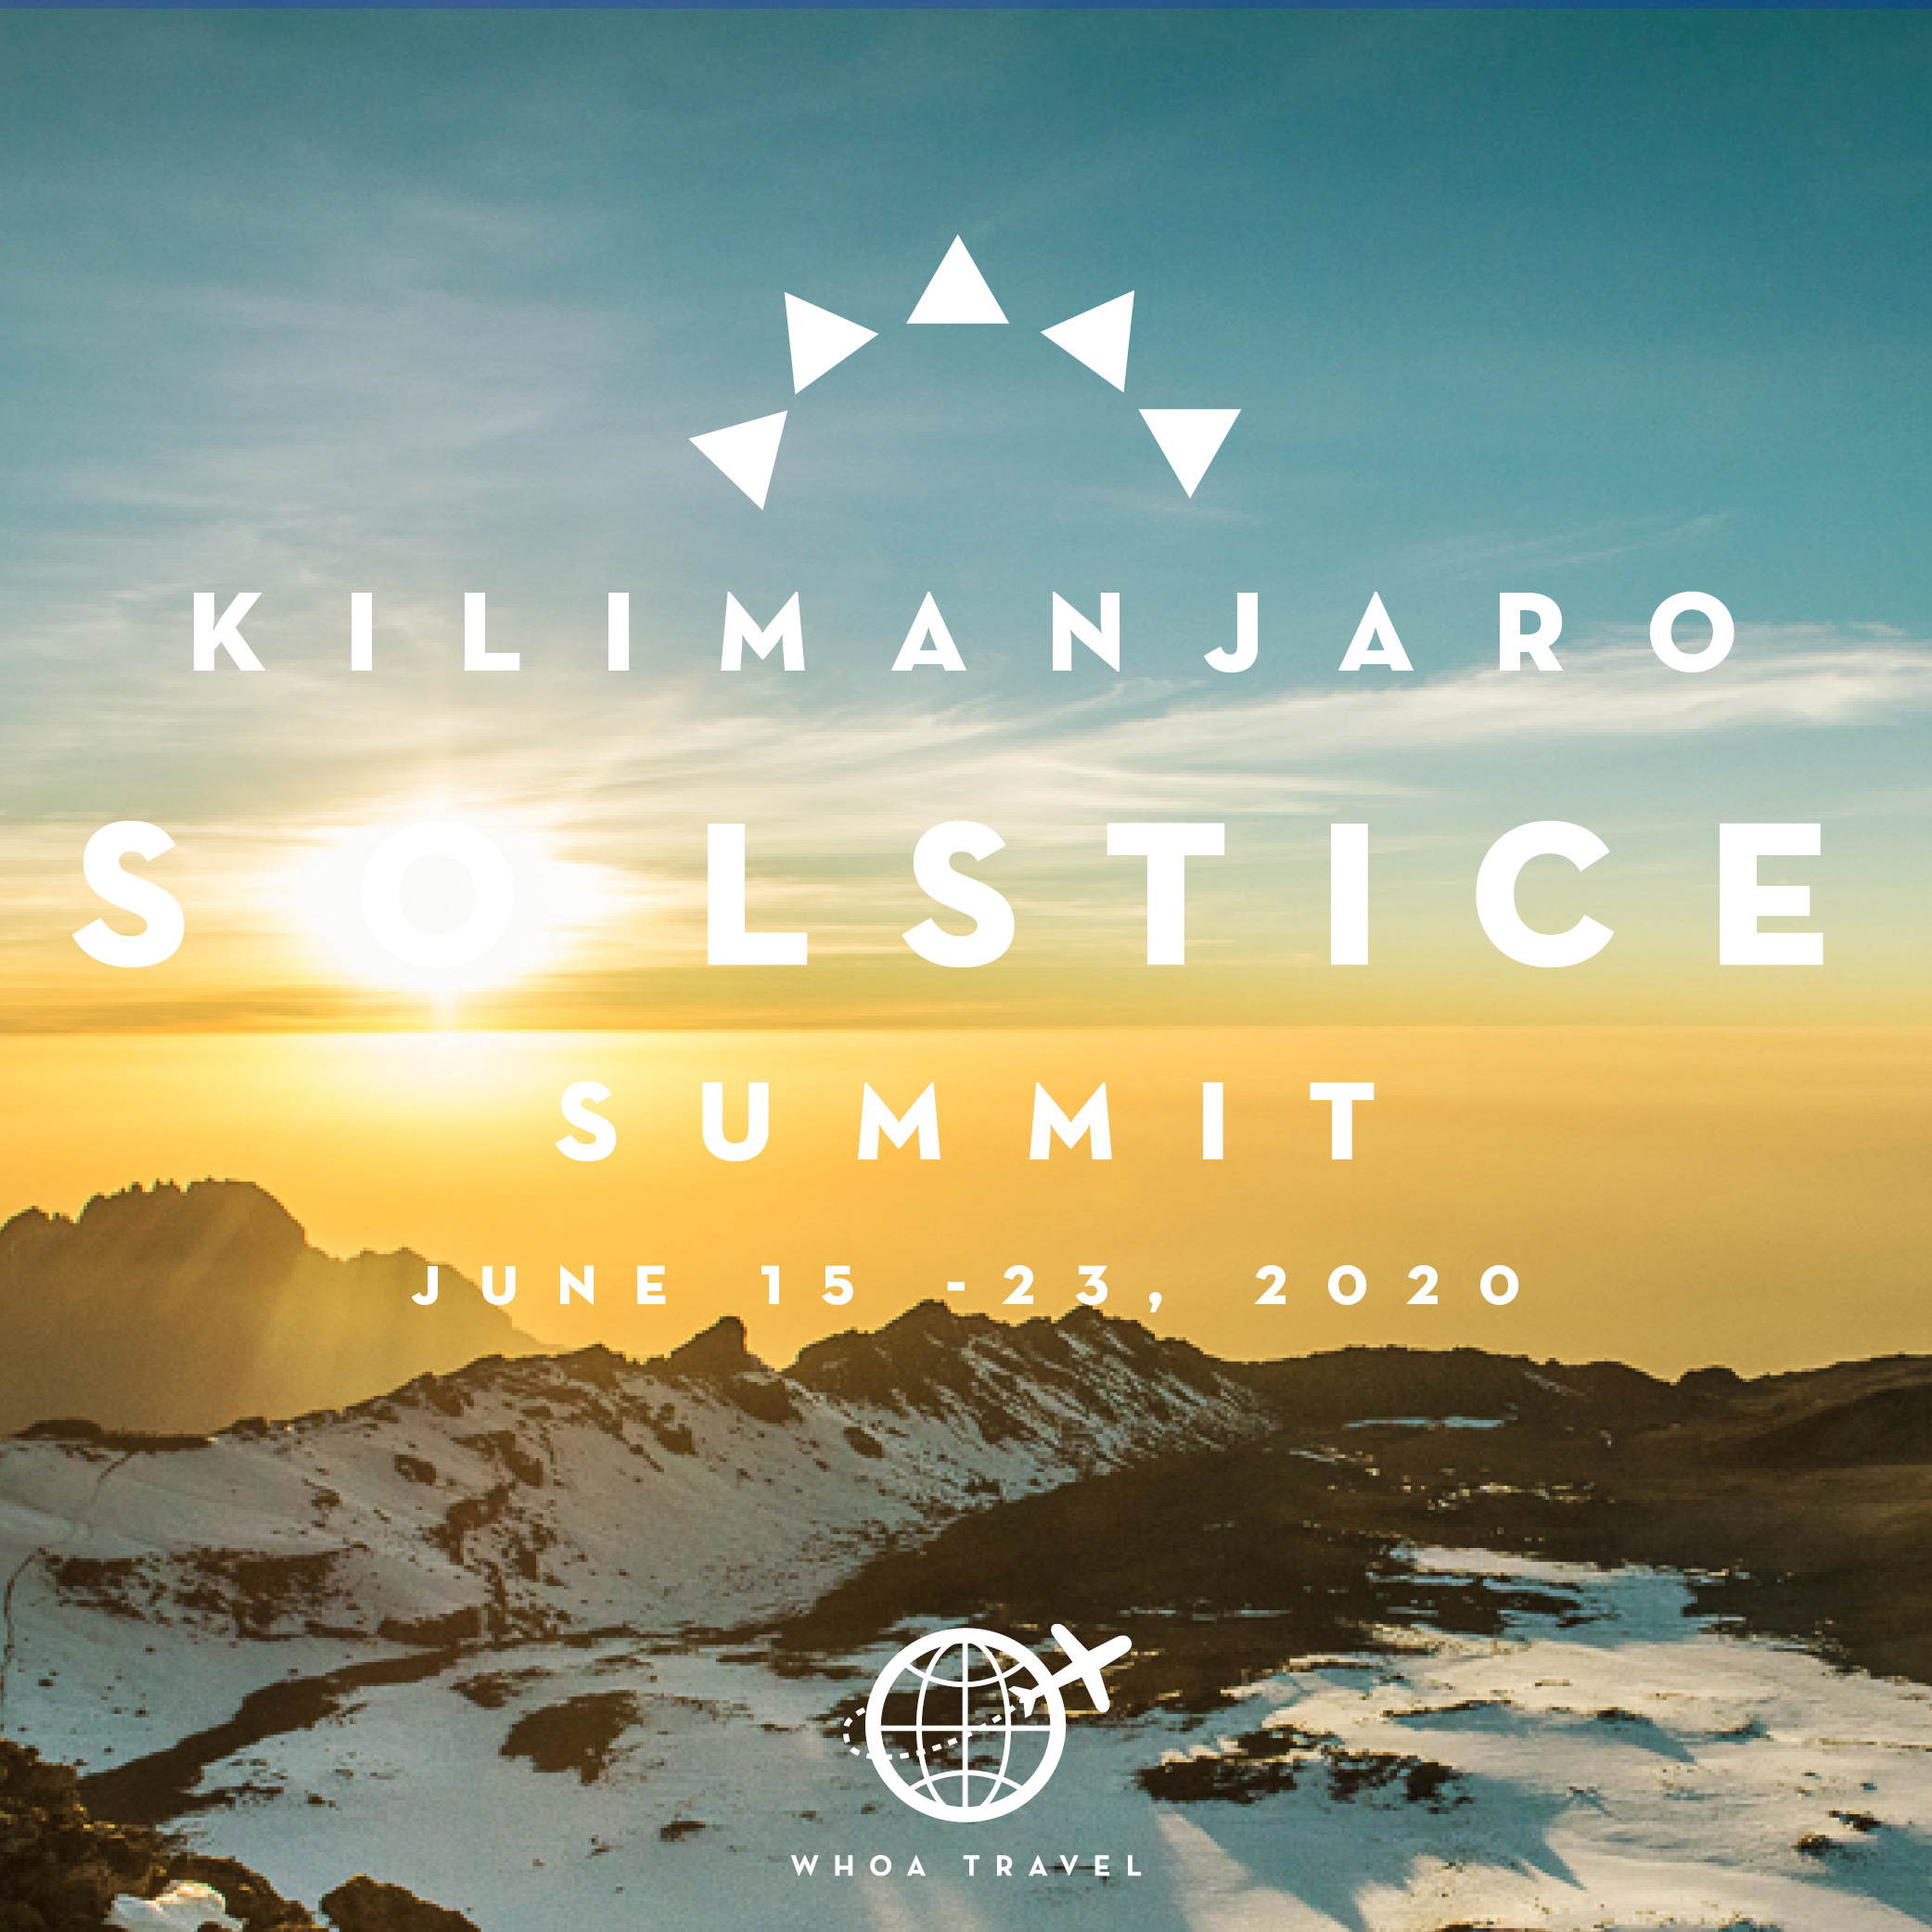 JUNE 15 - 23 - 2020KILIMANJARO: SOLSTICE SUMMITfrom $3,650